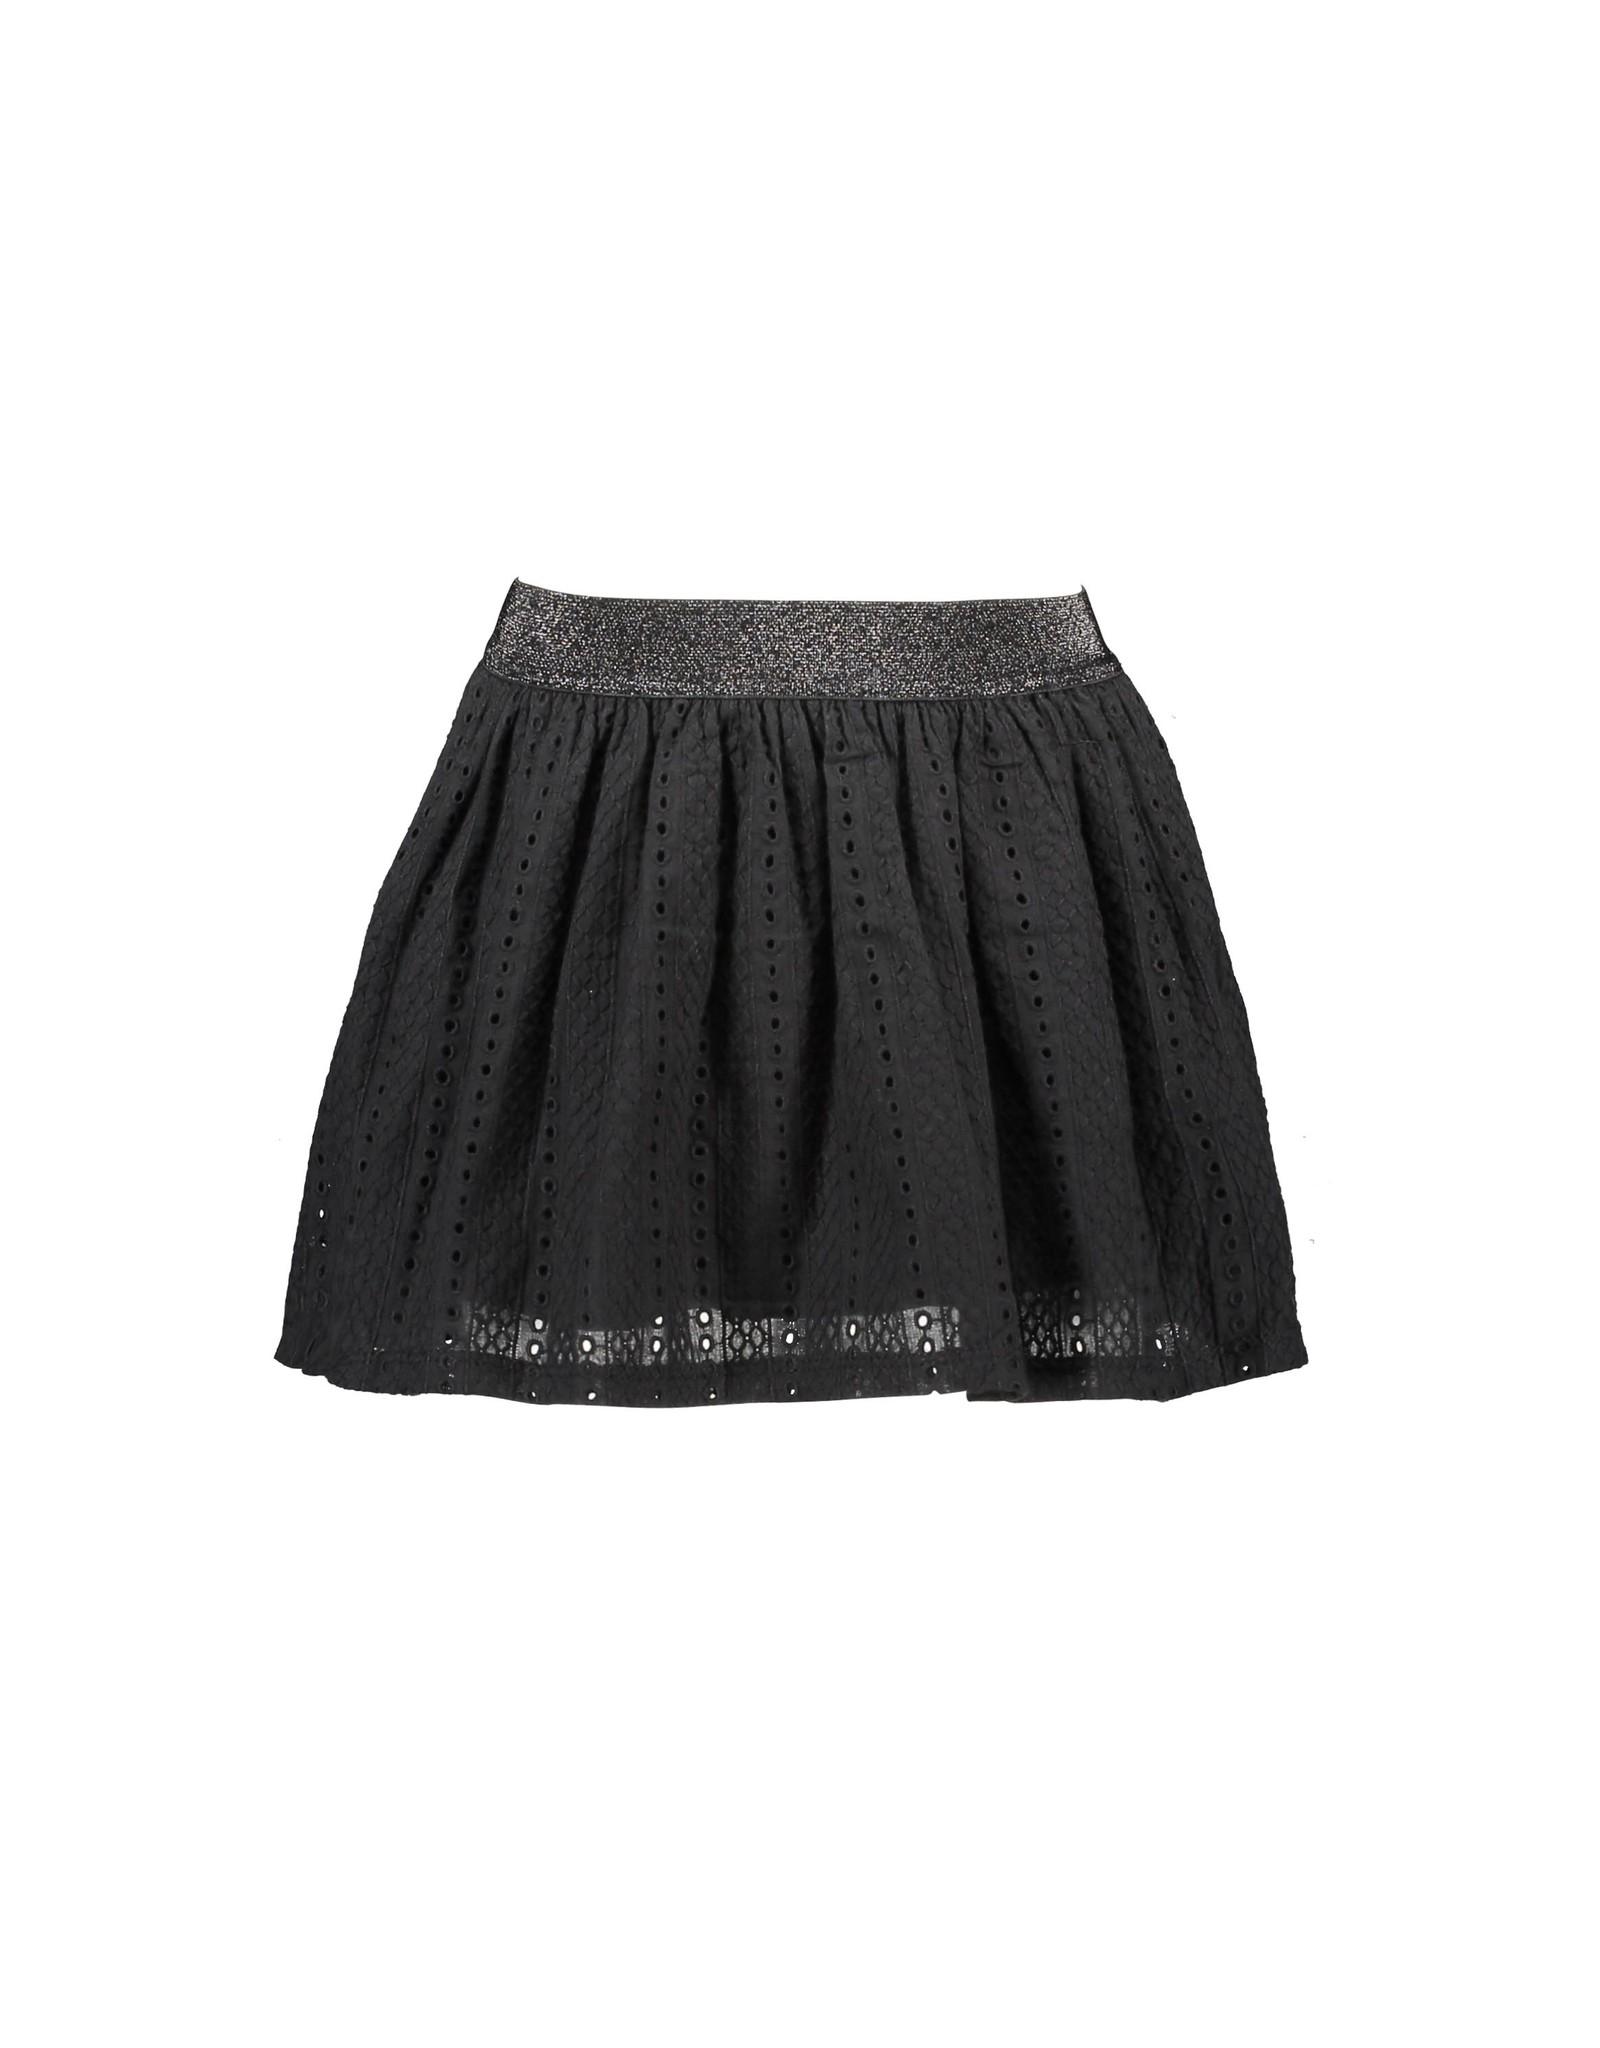 B-Nosy Girls cotton lace fabric skirt with black lining, Black